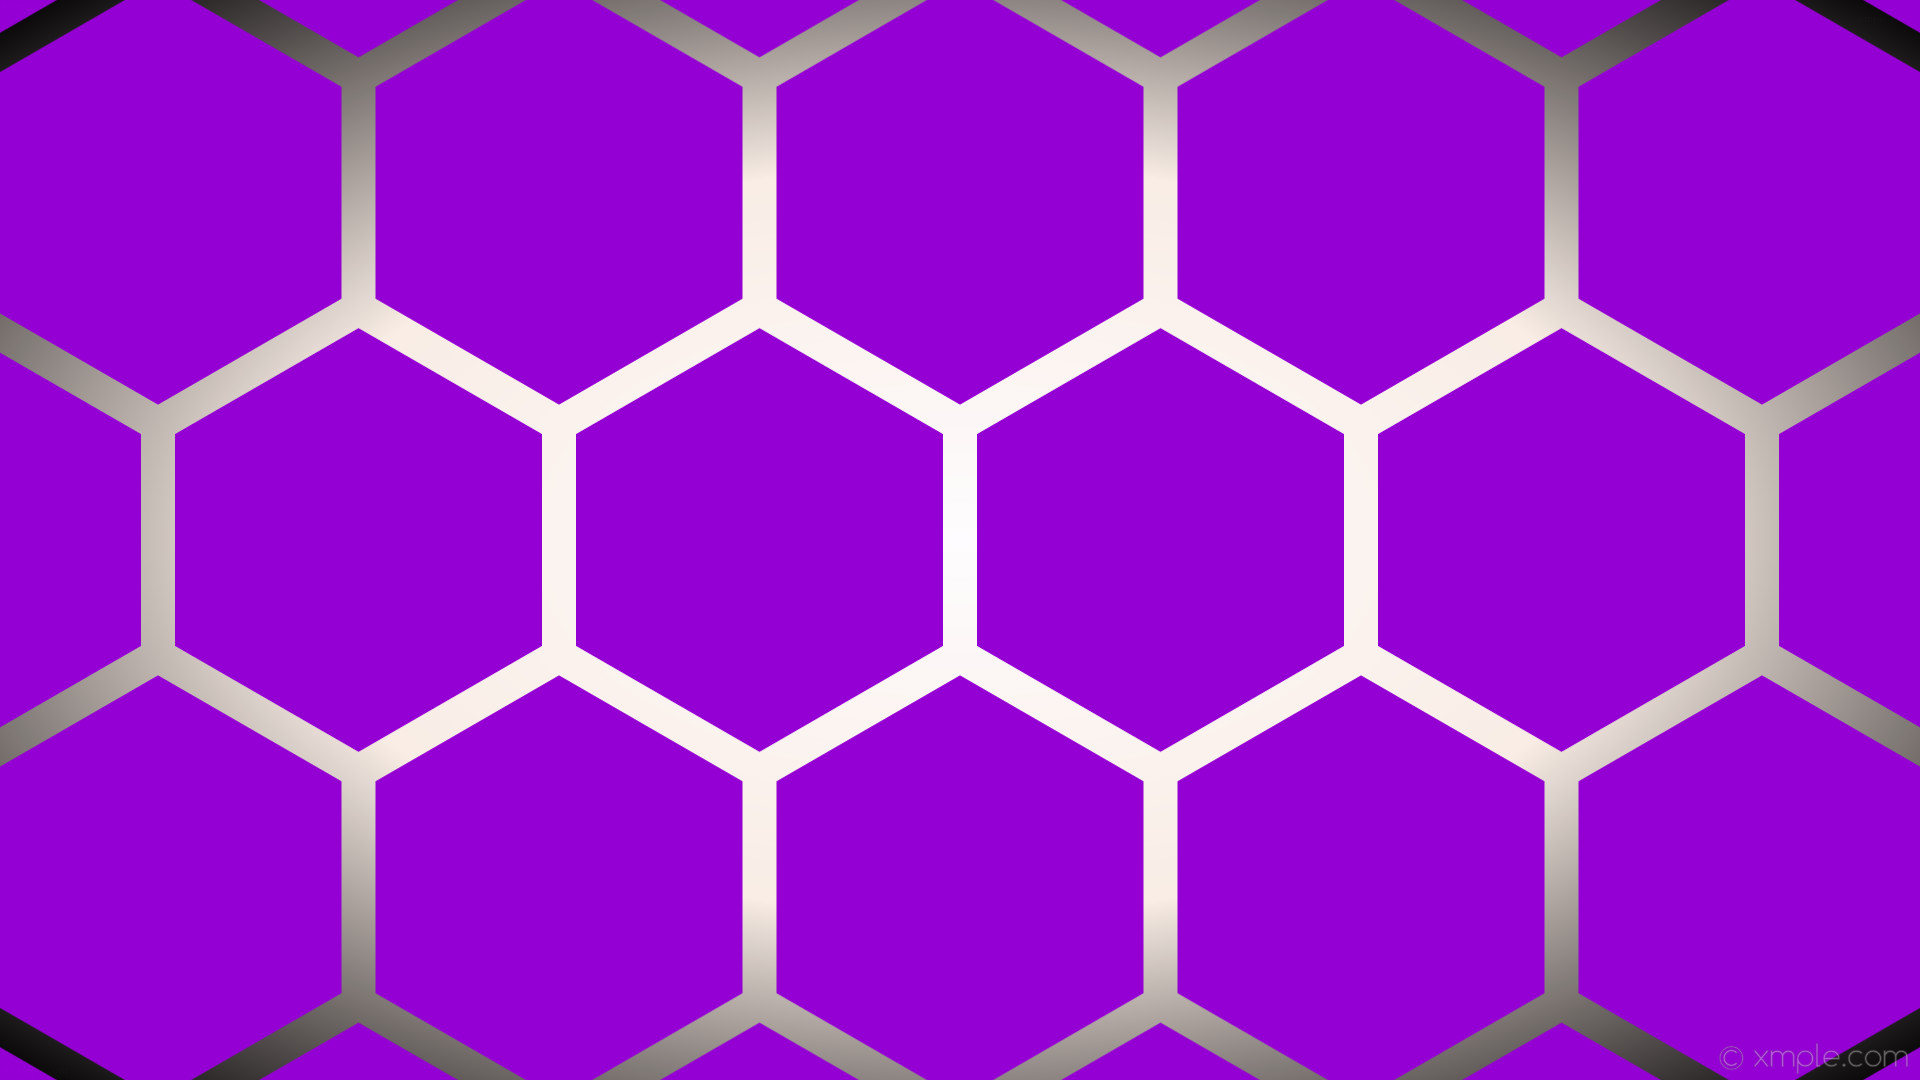 wallpaper white glow hexagon gradient purple black dark violet linen  #9400d3 #ffffff #faf0e6